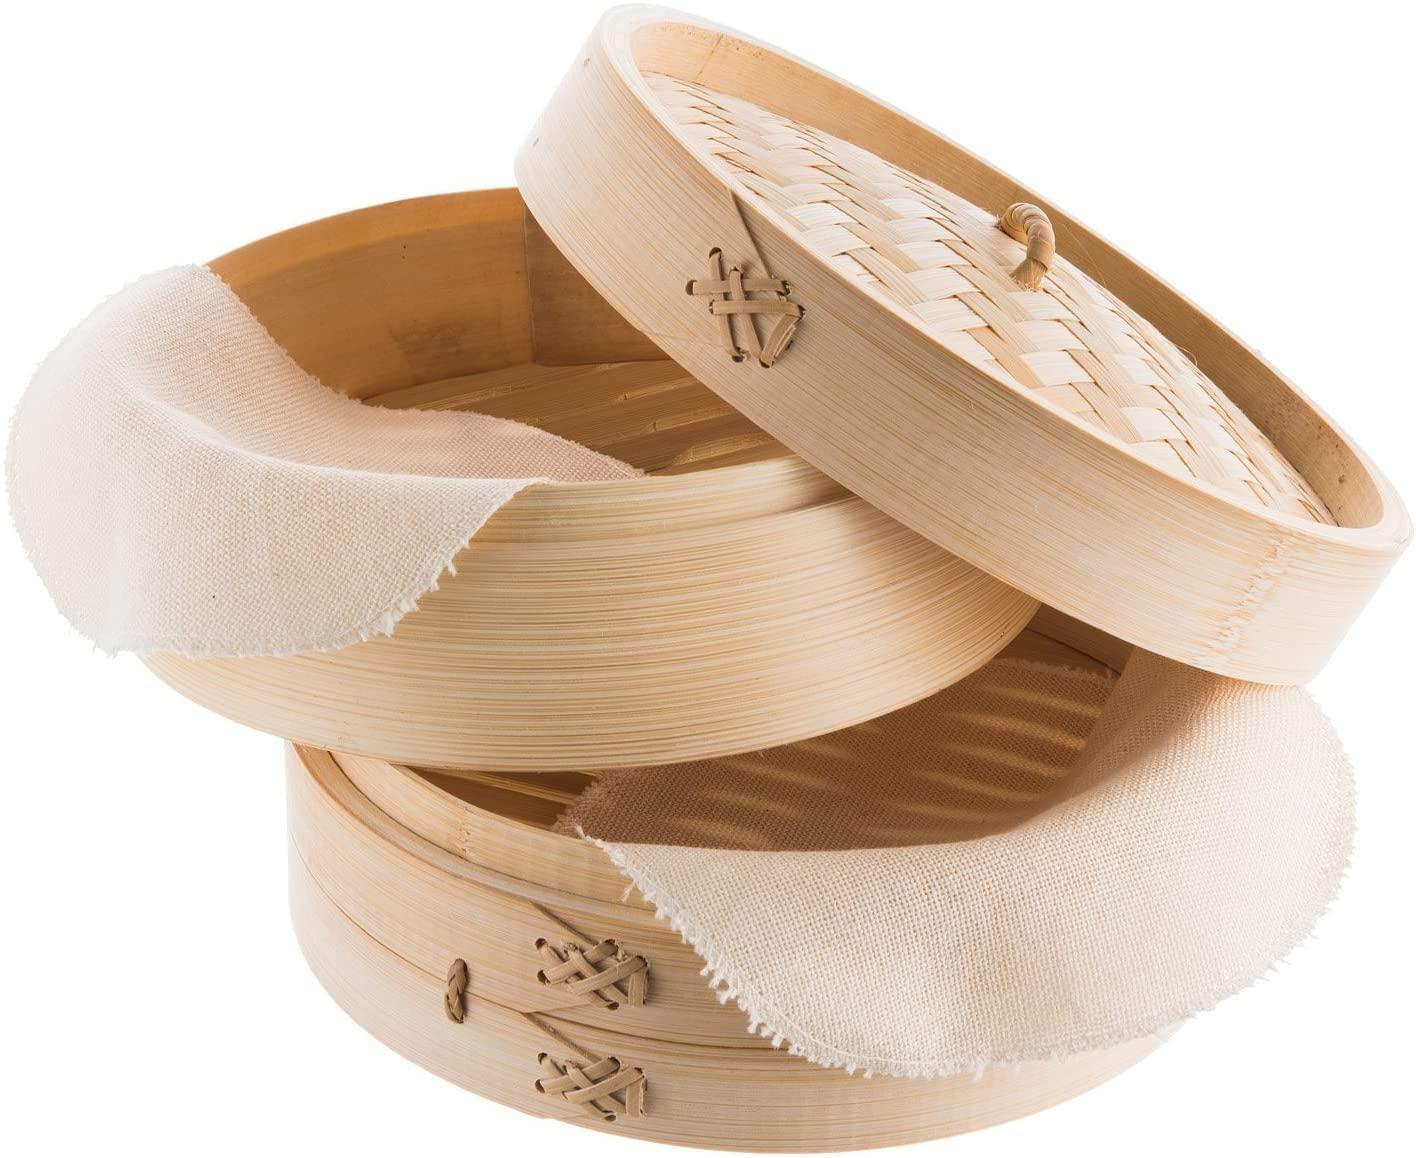 Reishunger Vaporera de bambú (Ø 20 cm, 2 Pisos) para arroz, Dim Sum, Verduras, Pescado y Carne, Incluye 2 Toallas de algodón, para 2 Personas